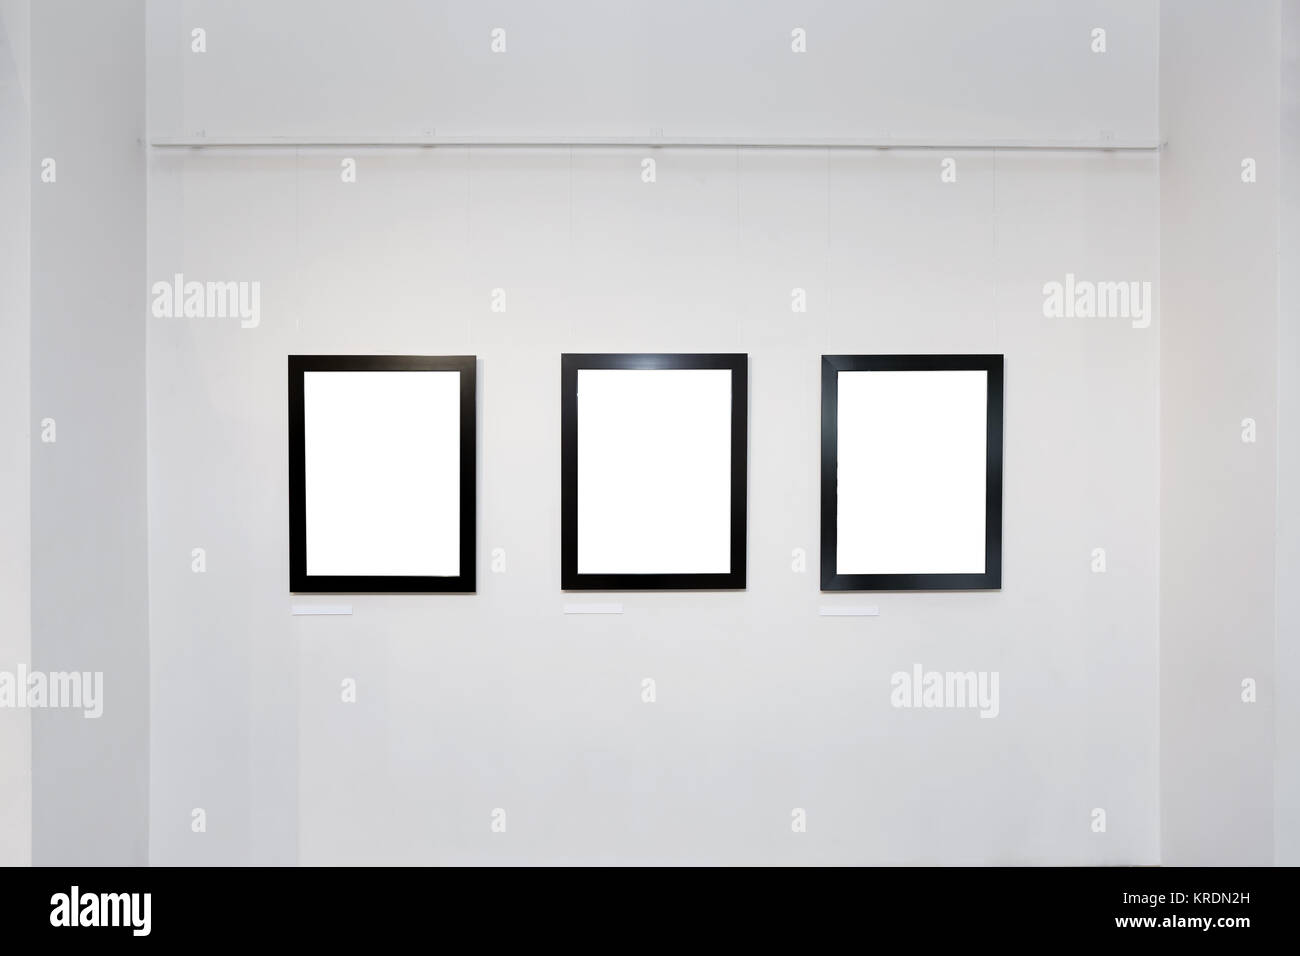 exhibition gallery interior with empty frames on wall - Empty Frames On Wall